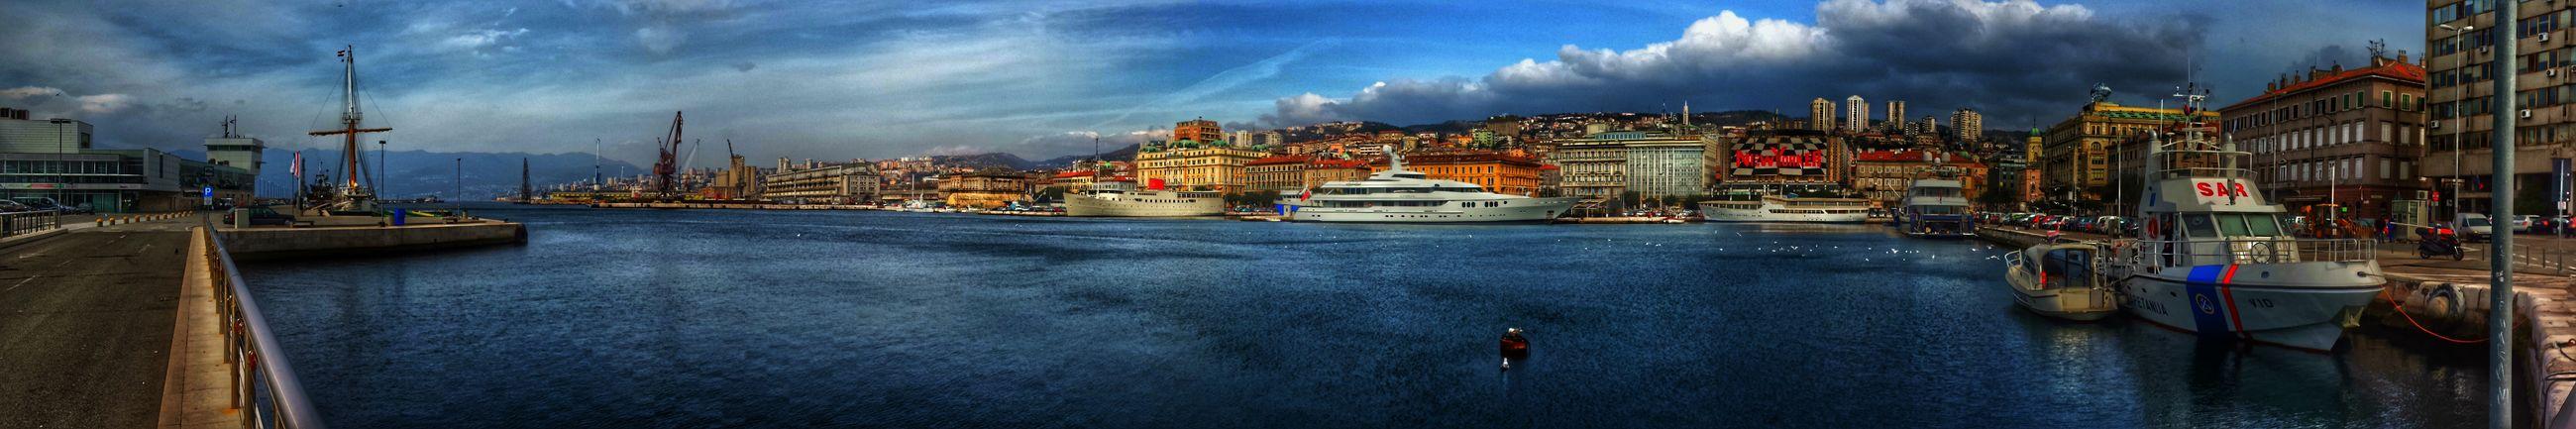 Enjoying Life Hello World Sea HDR #rijeka